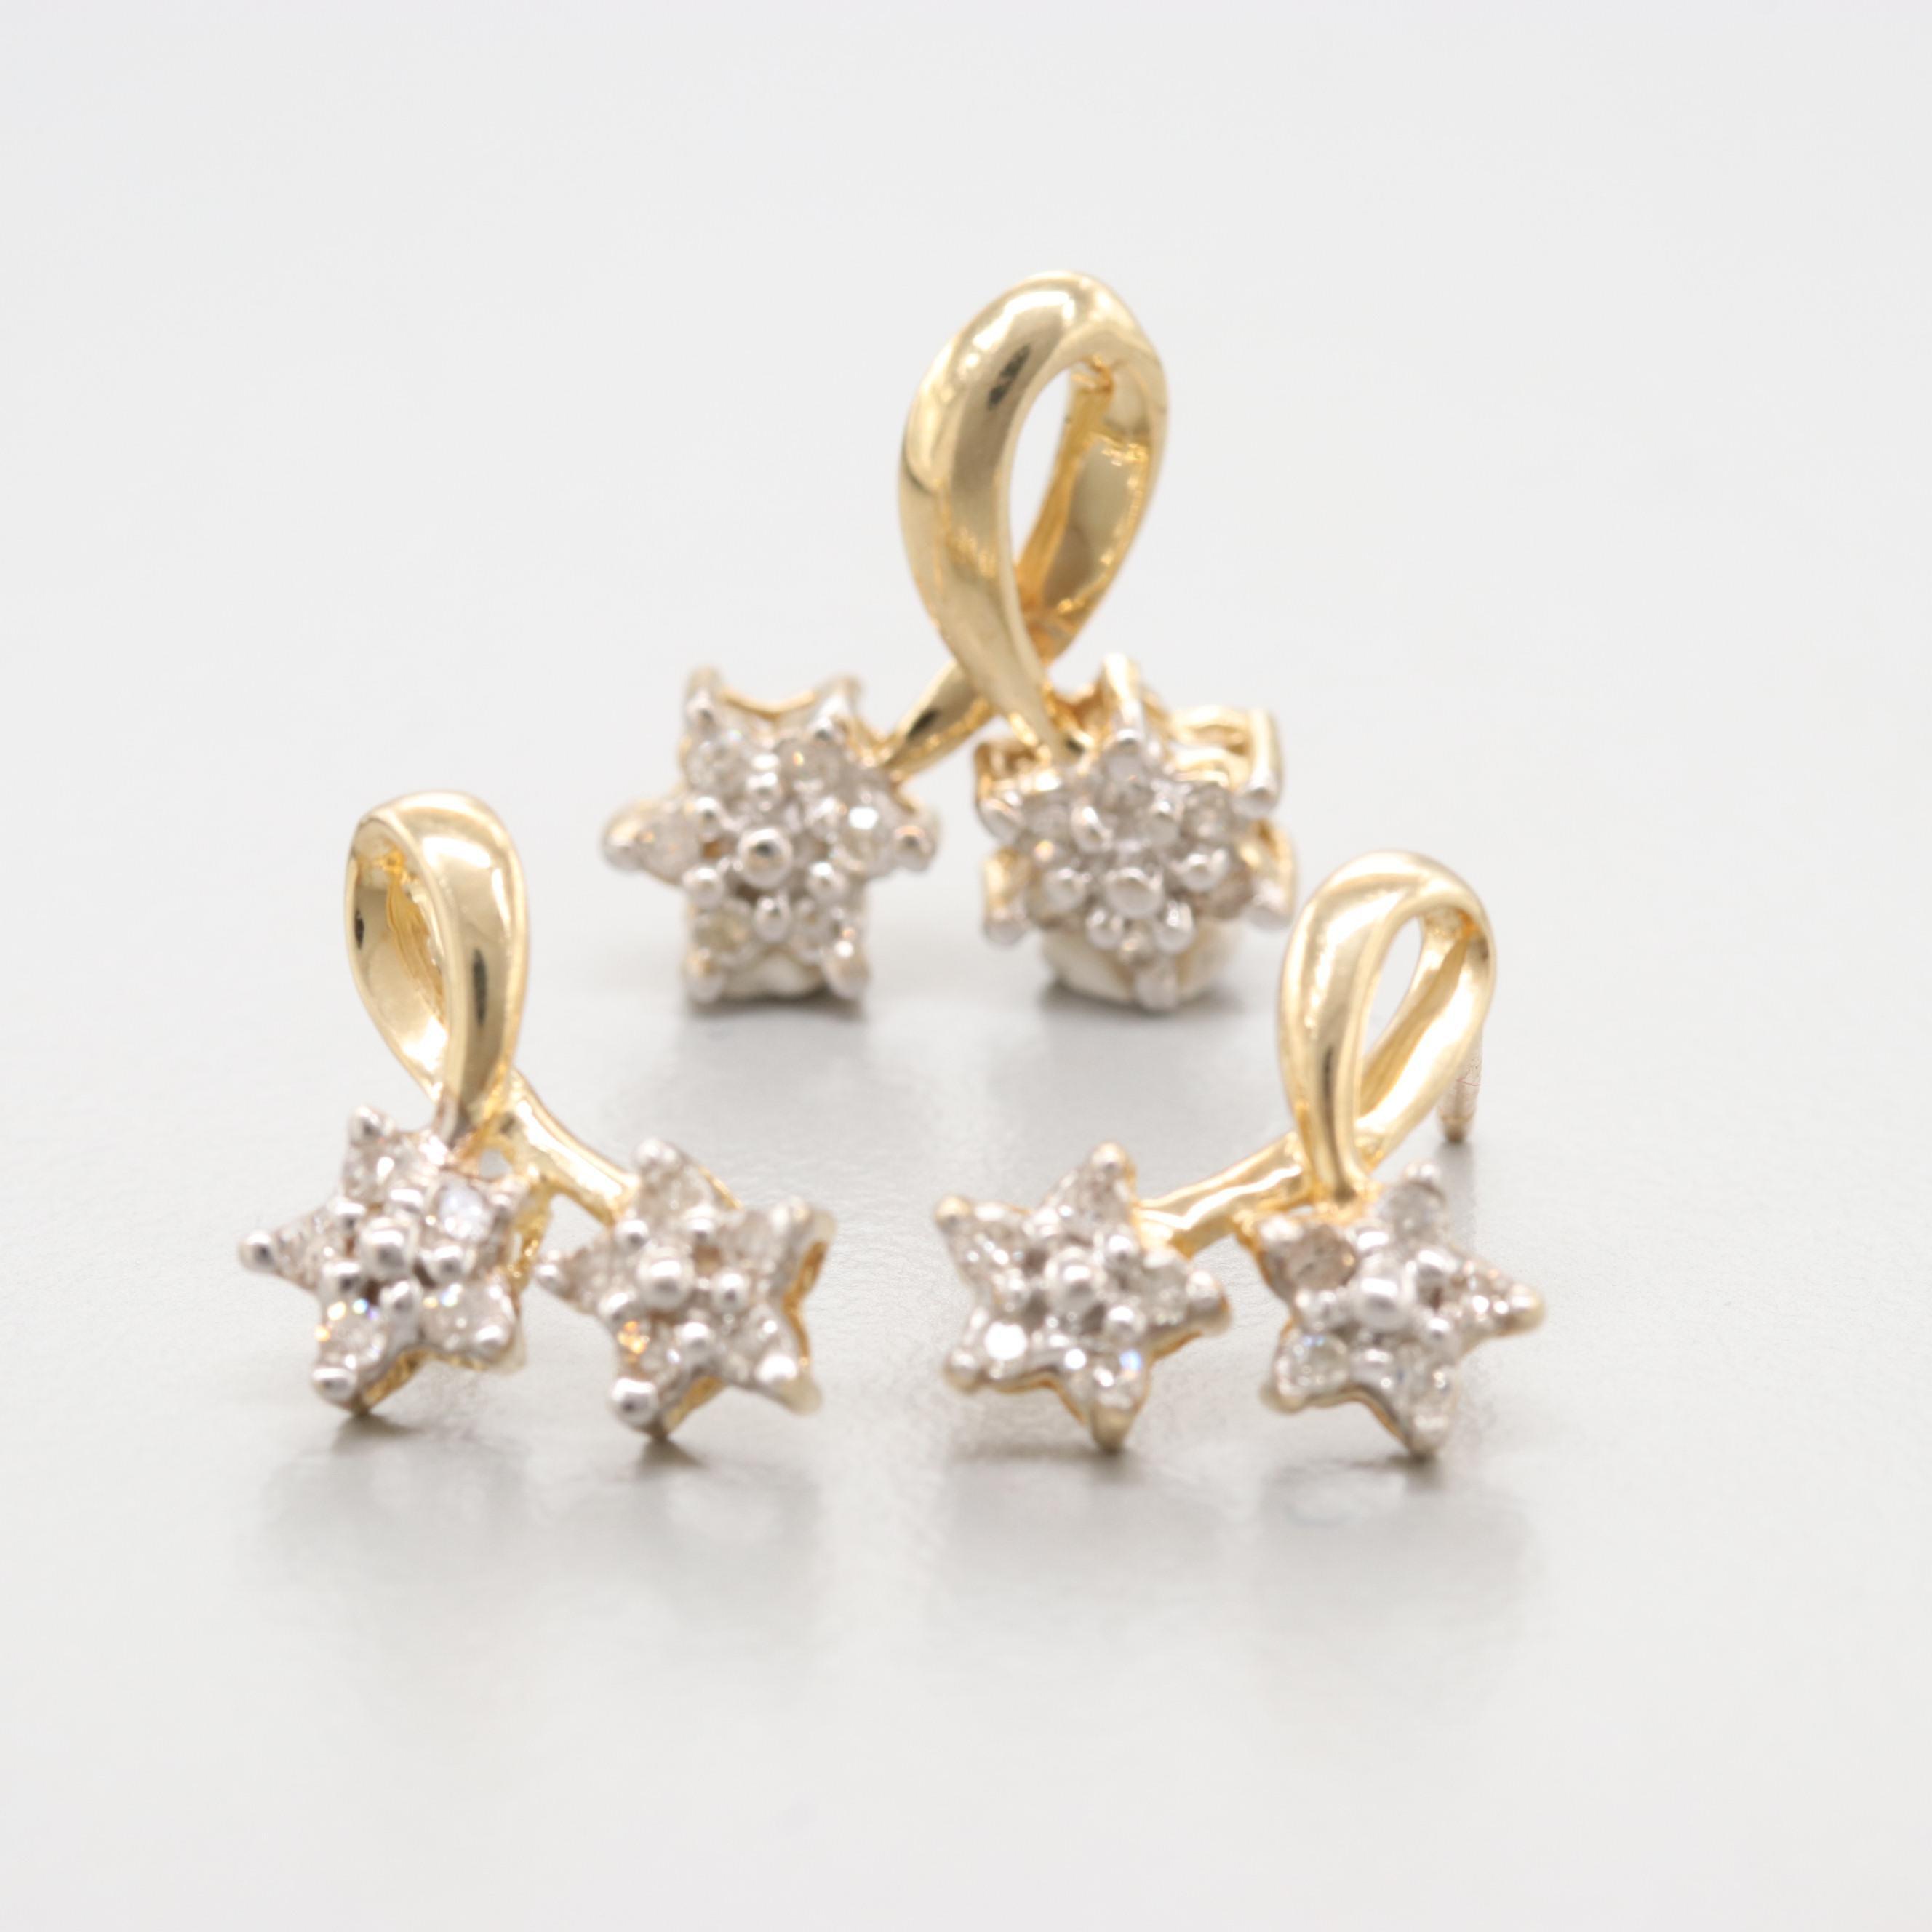 10K Yellow Gold Diamond Earrings and Pendant